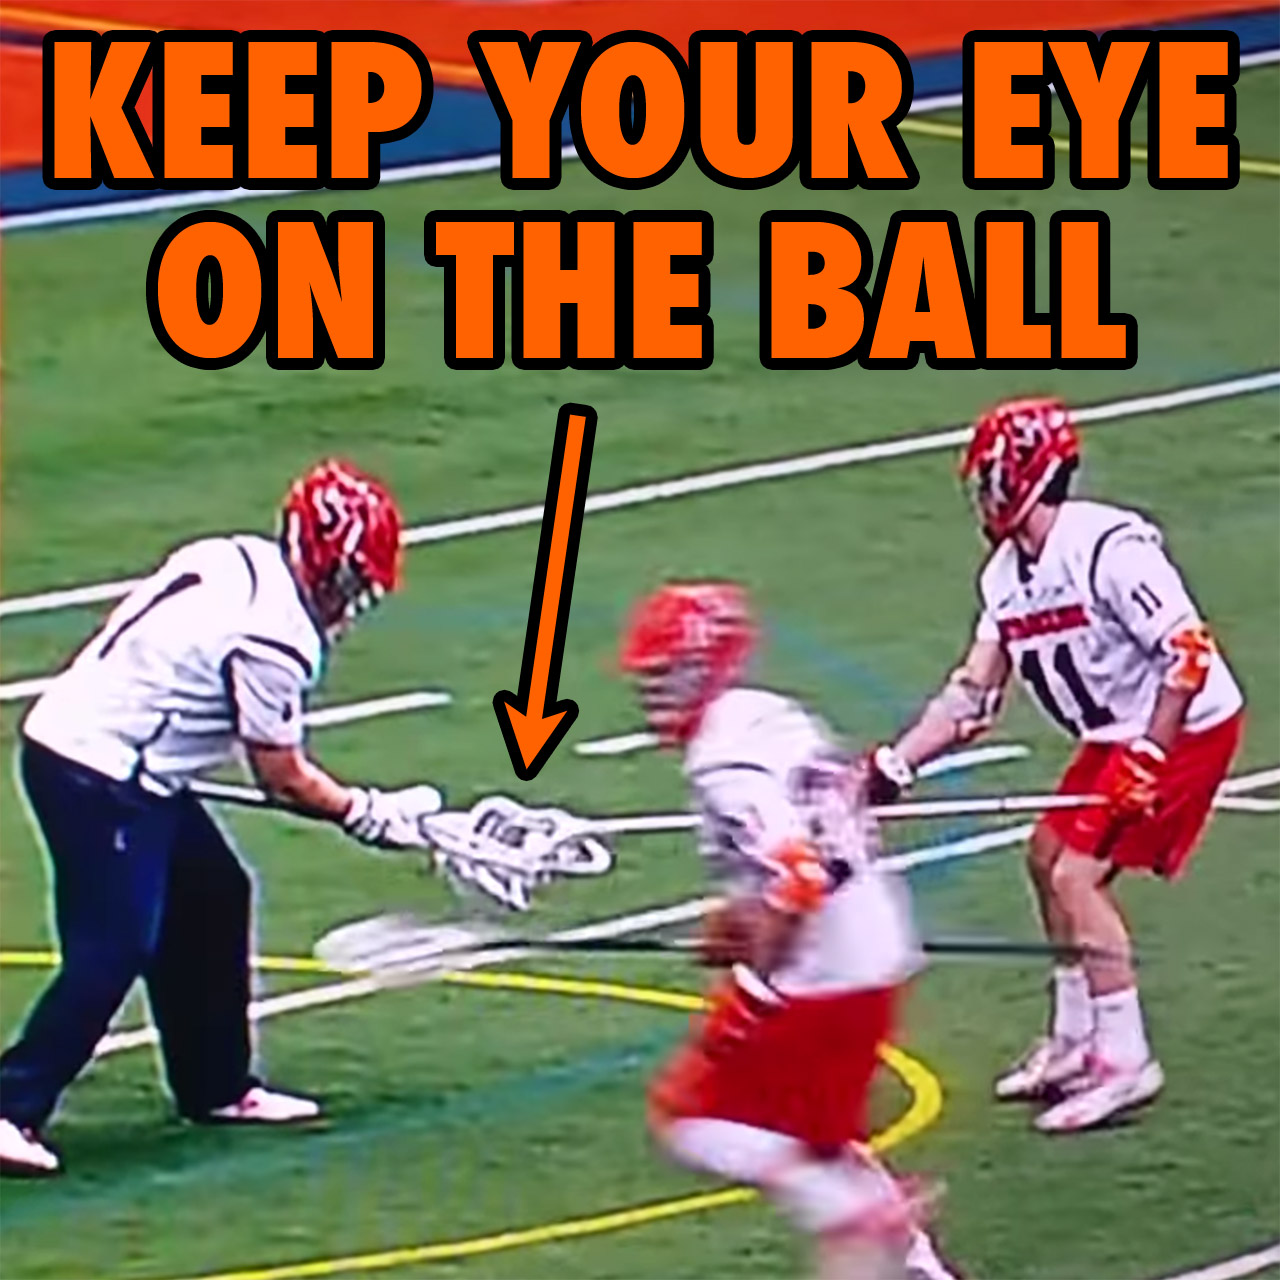 Syracuse lacrosse team pulls the hidden-ball trick on Virginia.